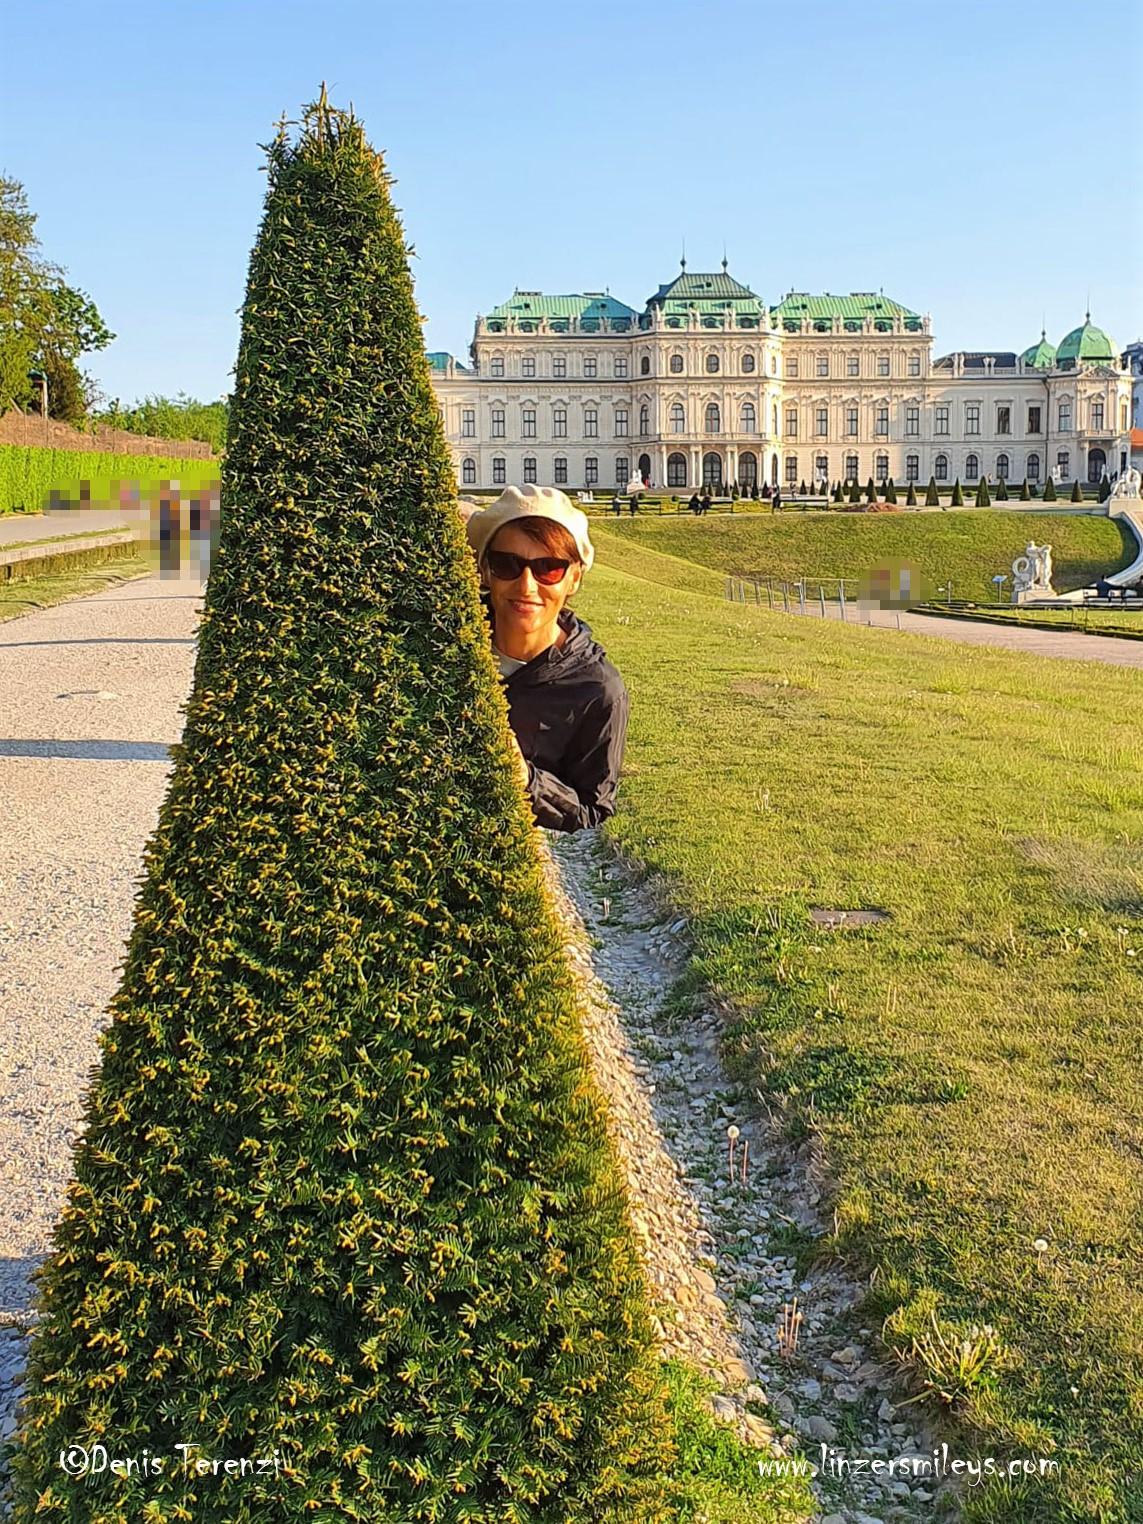 Belvederegarten Wien, Schloss Belvedere, #linzersmileys Daniela Terenzi, Foodblog, Foodbloggerin, gebürtige Linzerin, aus Österreich, #Linz